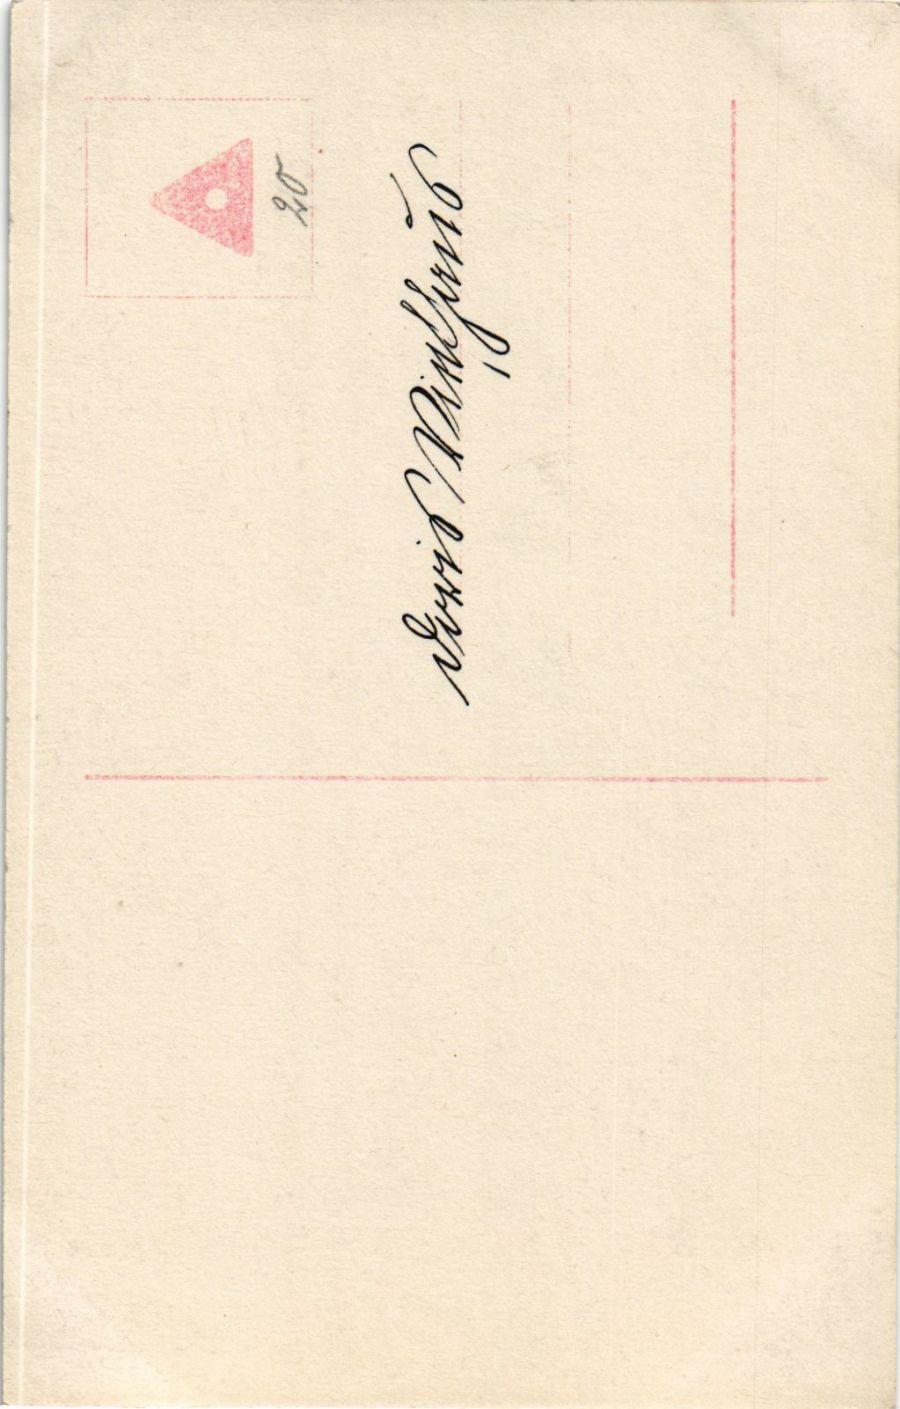 CPA-AK-Kronprinz-Wilhelm-im-Felde-GERMAN-ROYALTY-867518 Indexbild 2